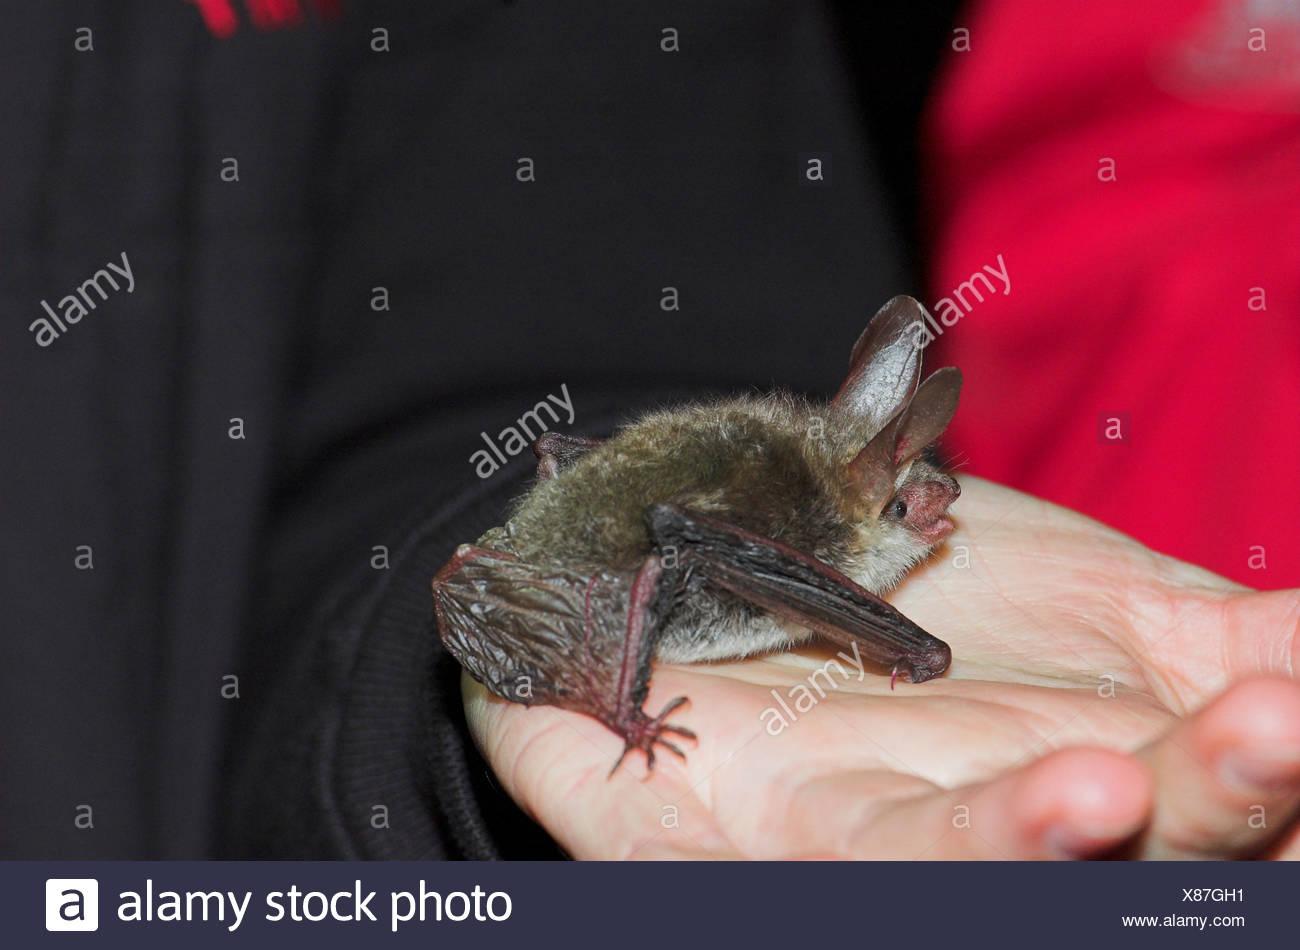 bat (Chiroptera), on a hand - Stock Image